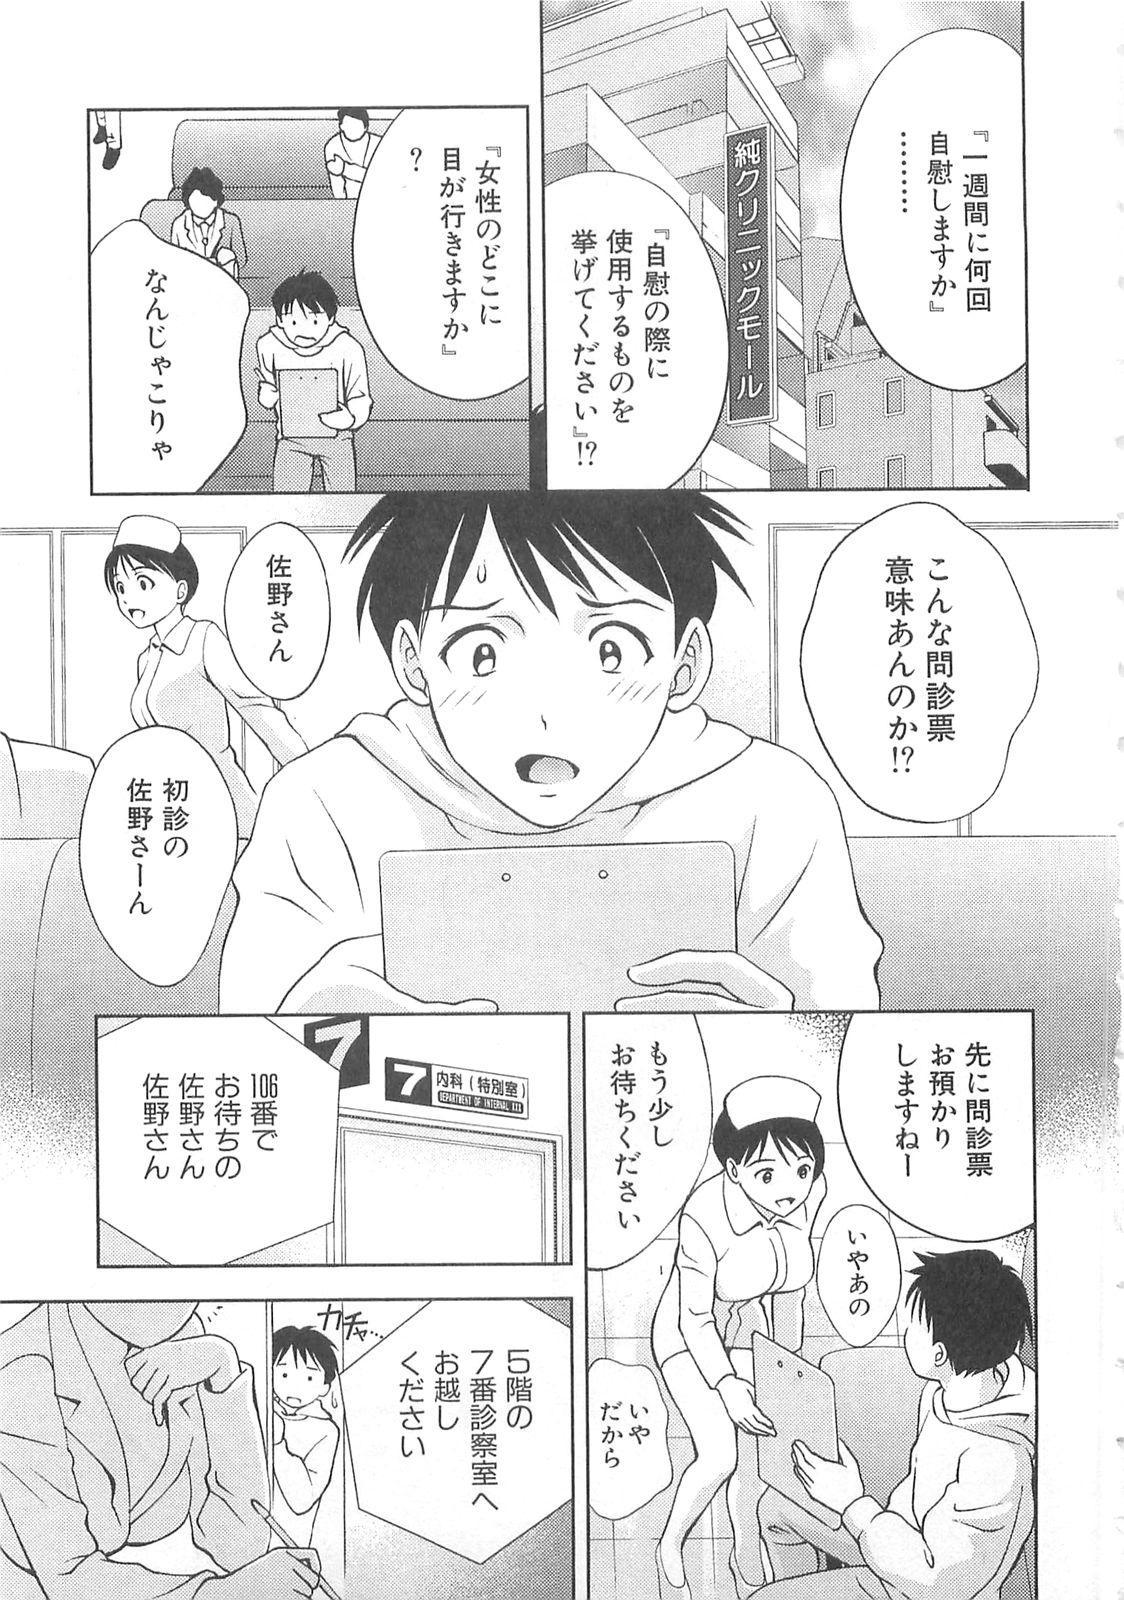 Tenshi no Kyuu - Angel's Pretty Hip 125